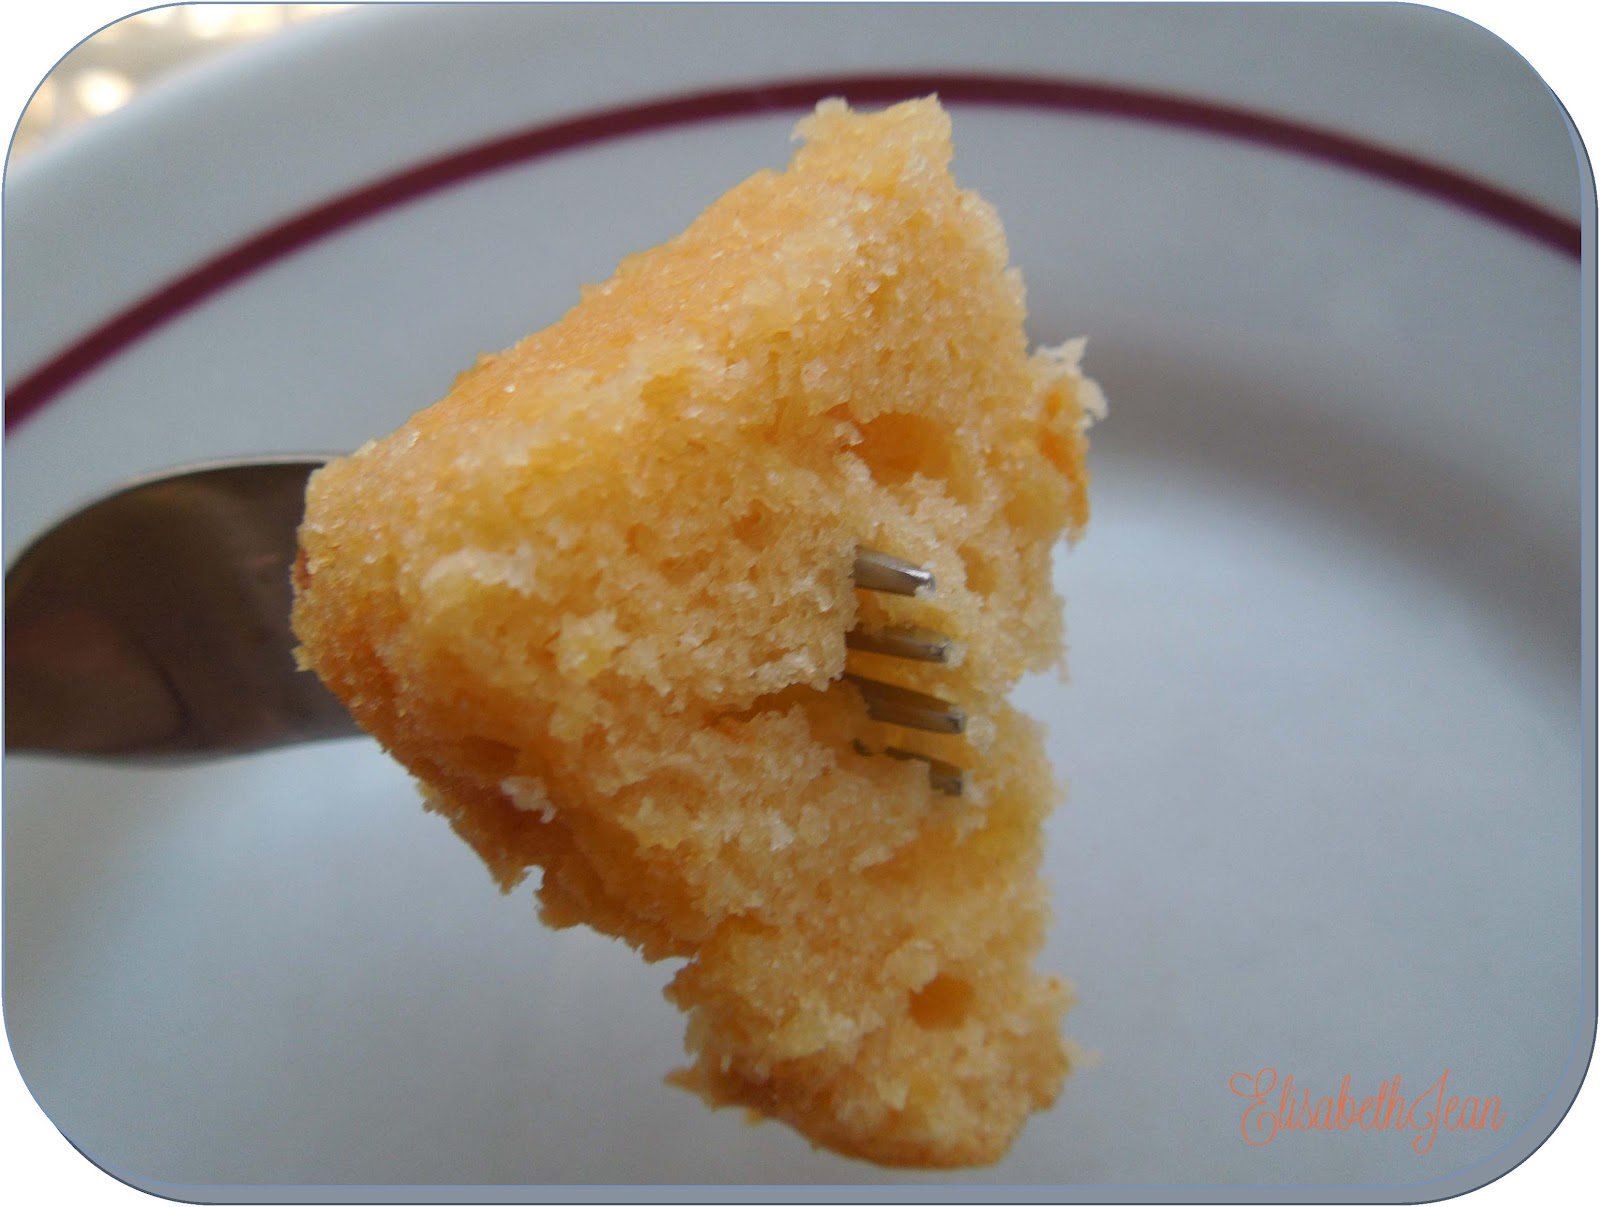 Elisabeth Jean: Mario Batali's Grapefruit & Honey Cake